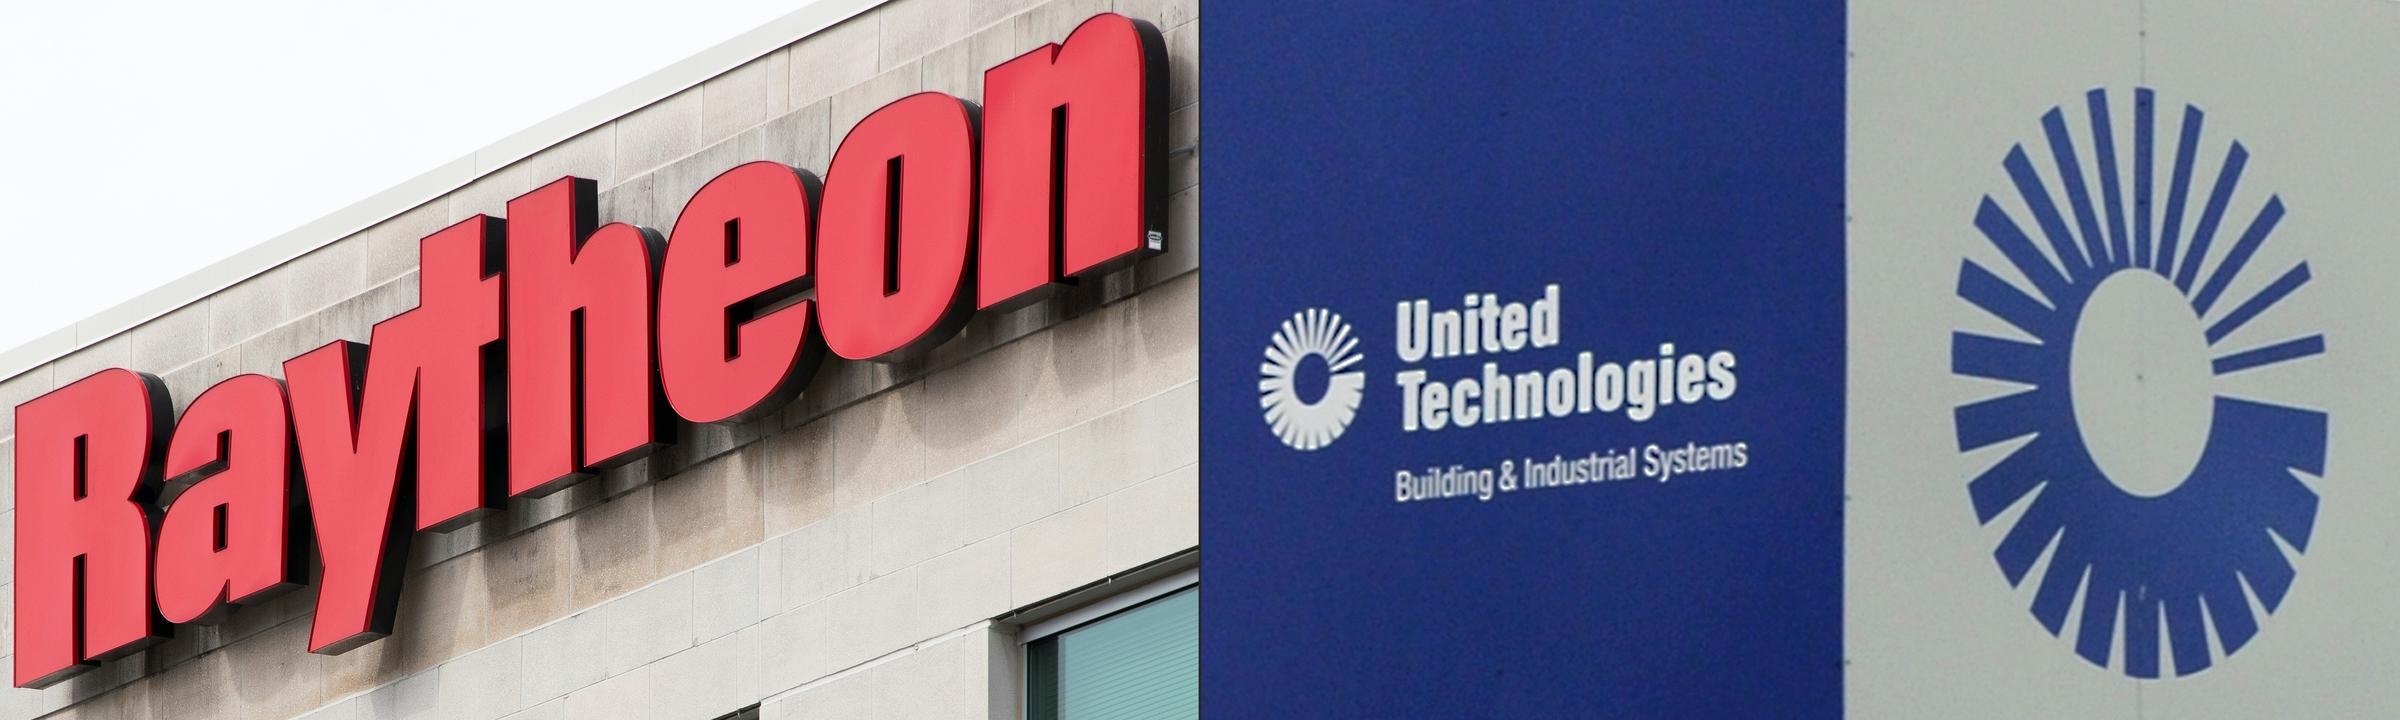 Raytheon, United Technologies Merger Will Create A New.